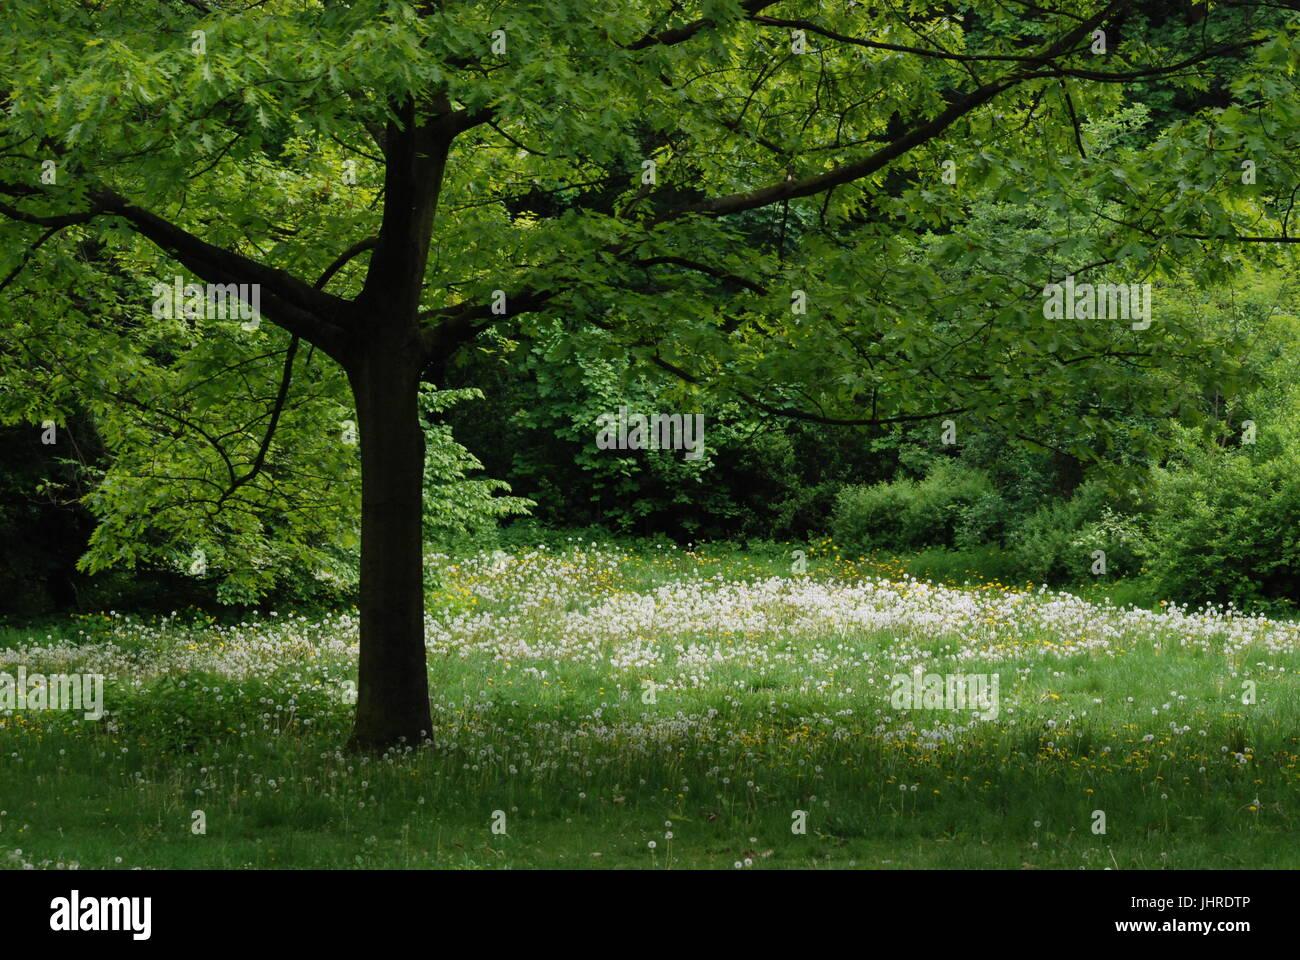 Dandelion (Pusteblume) in Goethe Park in Berlin-Wedding on May 8, 2012, Germany - Stock Image